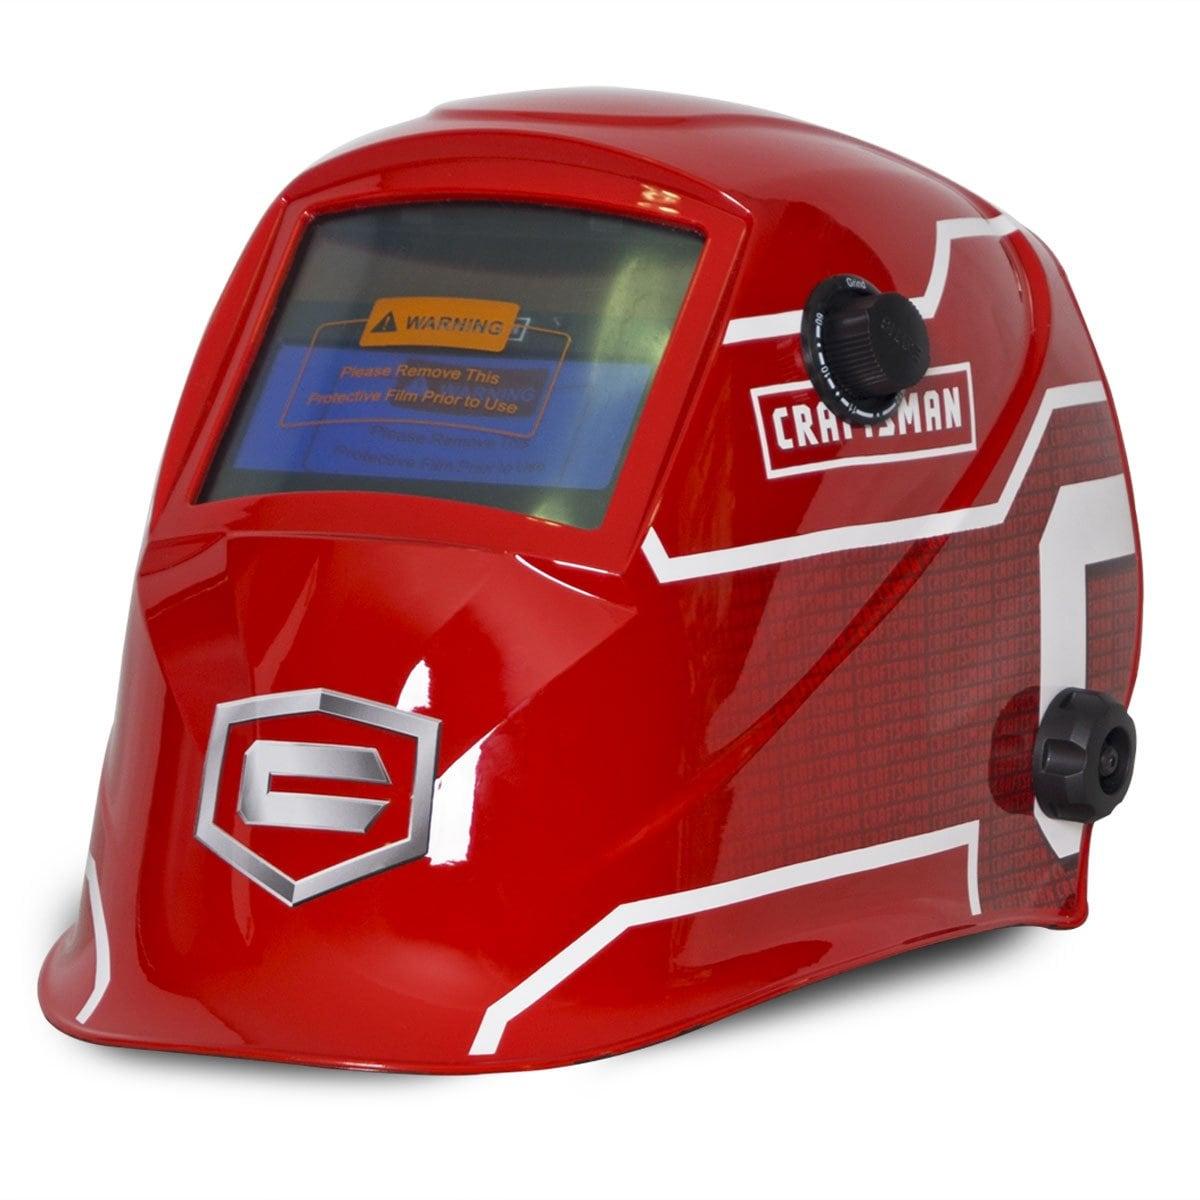 Careta Electrónica Fotosensible para Soldar Visiotronic460 Craftsman Dlvt46